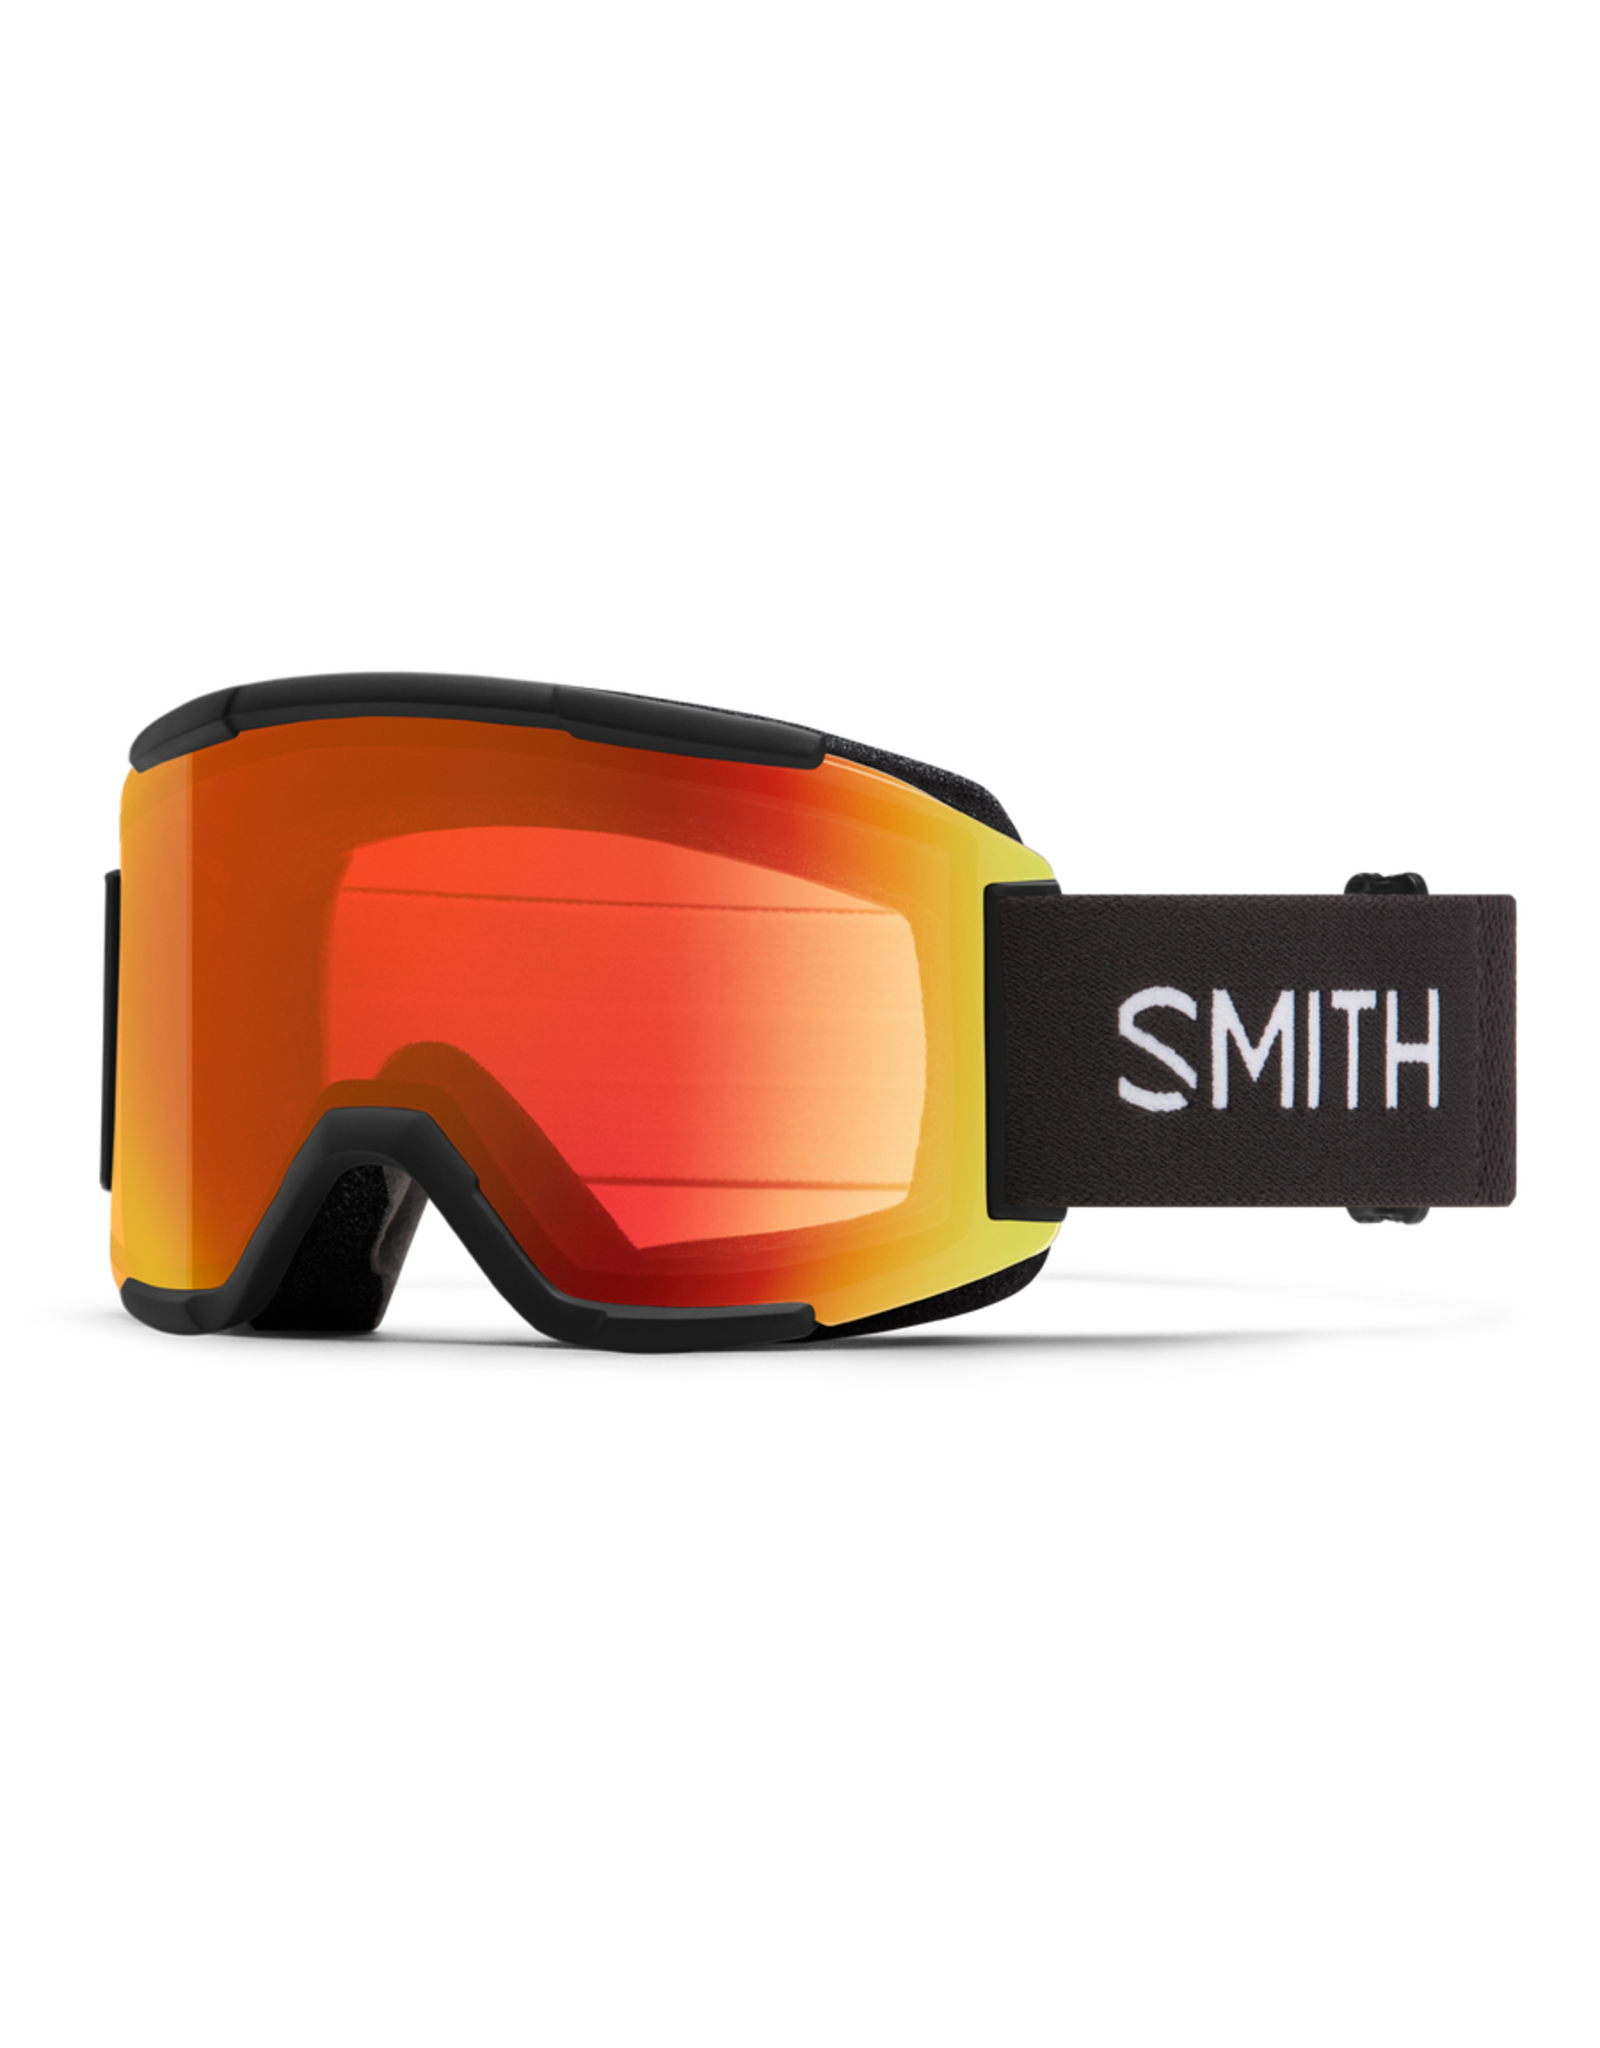 SMITH SQUAD BLACK EVERYDAY RED MIRROR W21